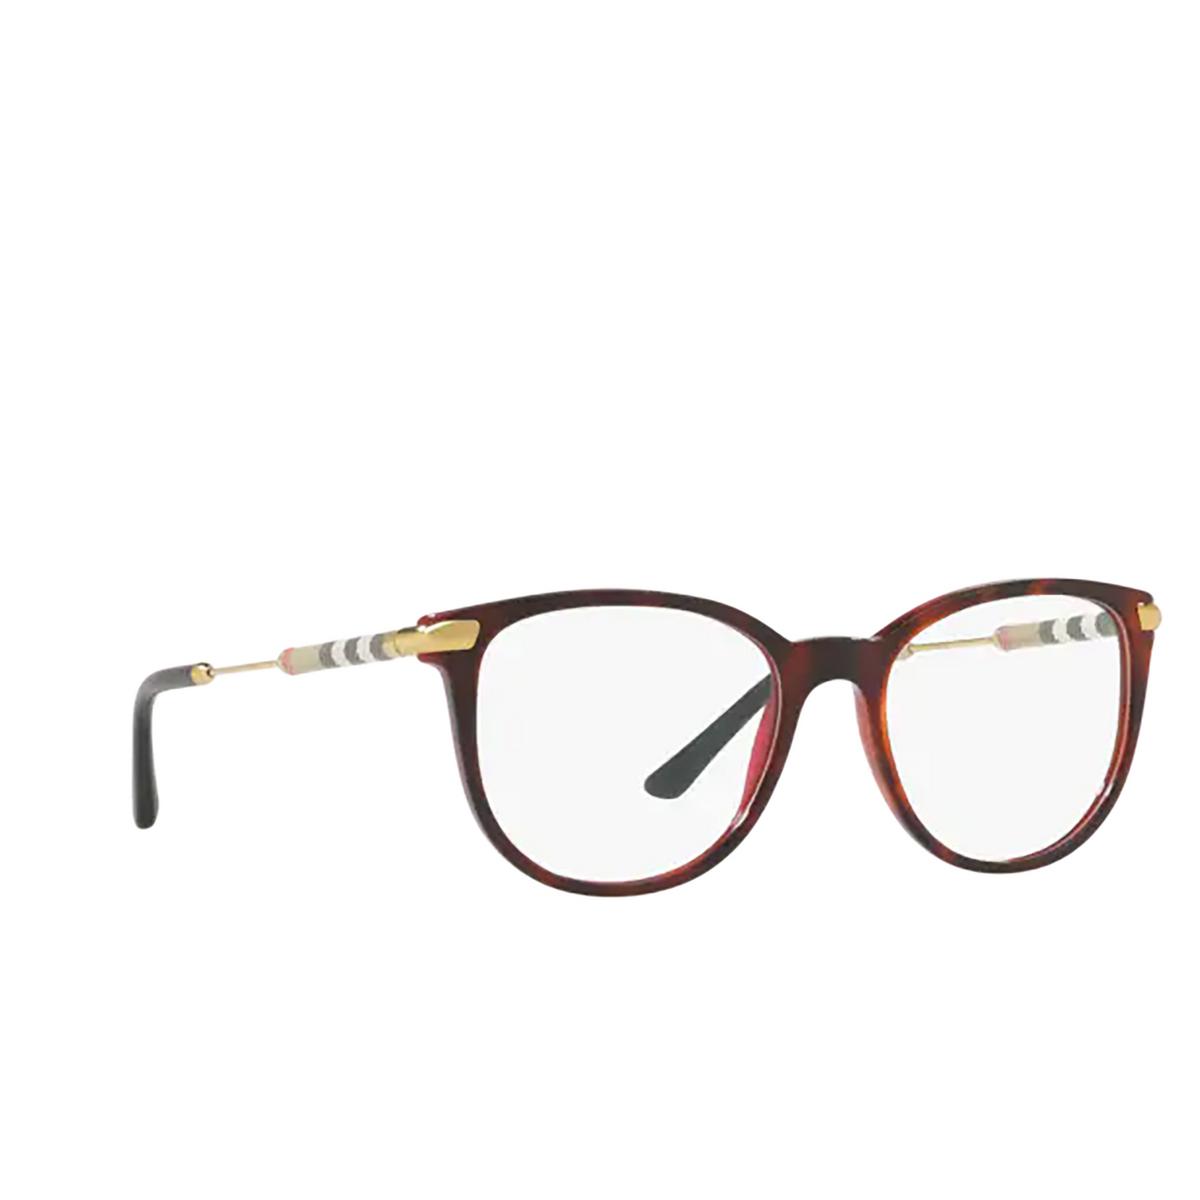 Burberry® Square Eyeglasses: BE2255Q color Top Havana On Bordeaux 3657 - three-quarters view.